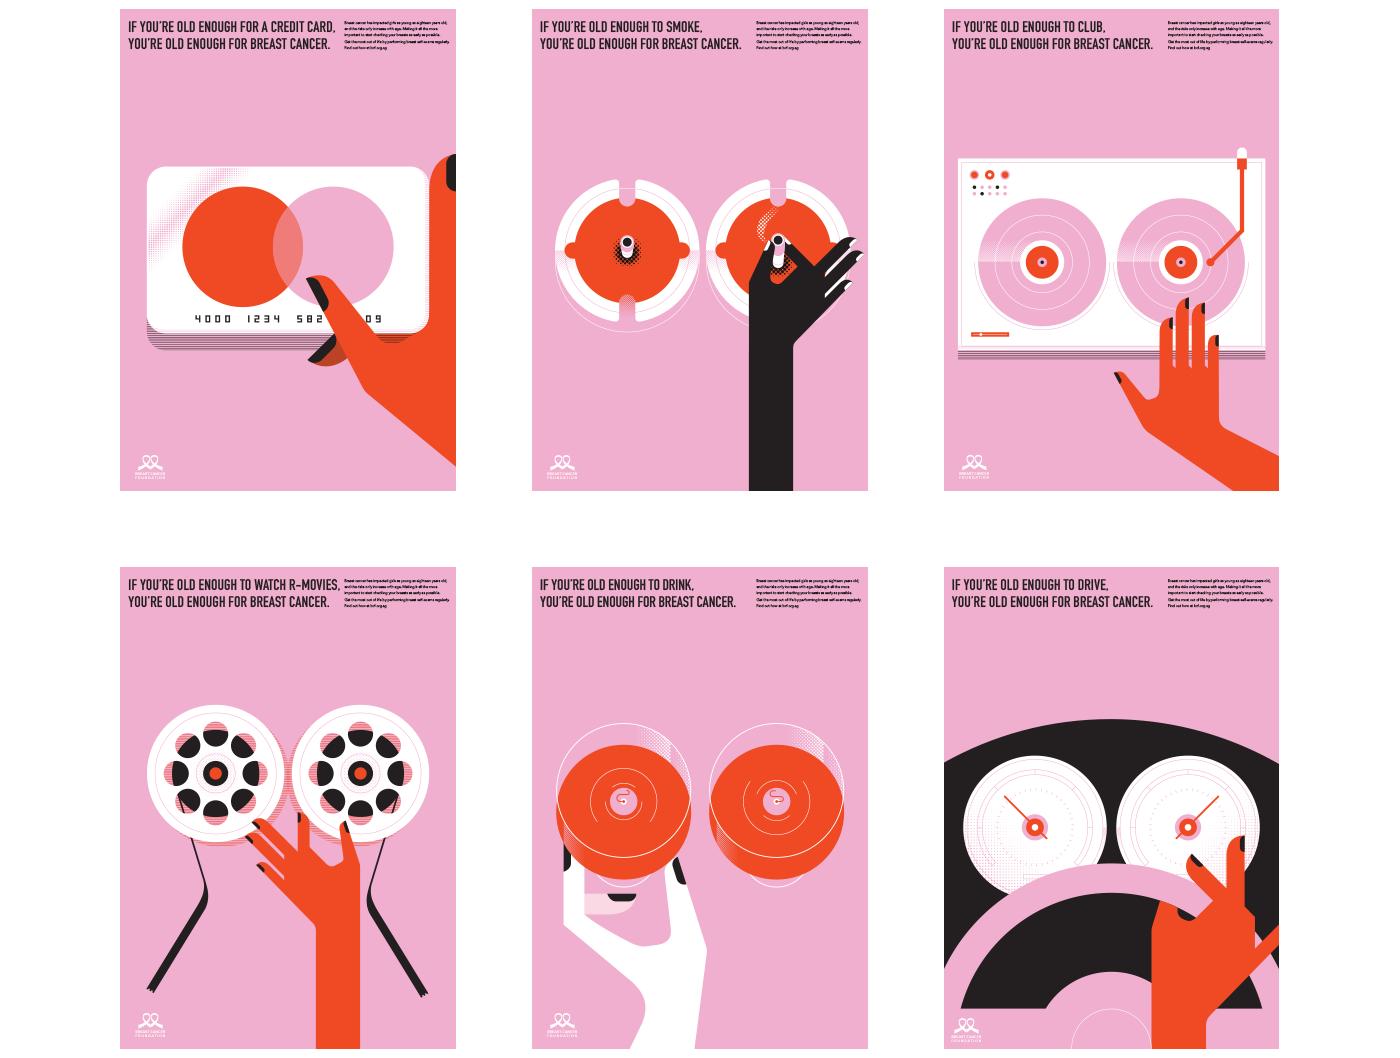 Breastcancer Website7 Graphic Design Posters Design Campaign Graphic Design Poster